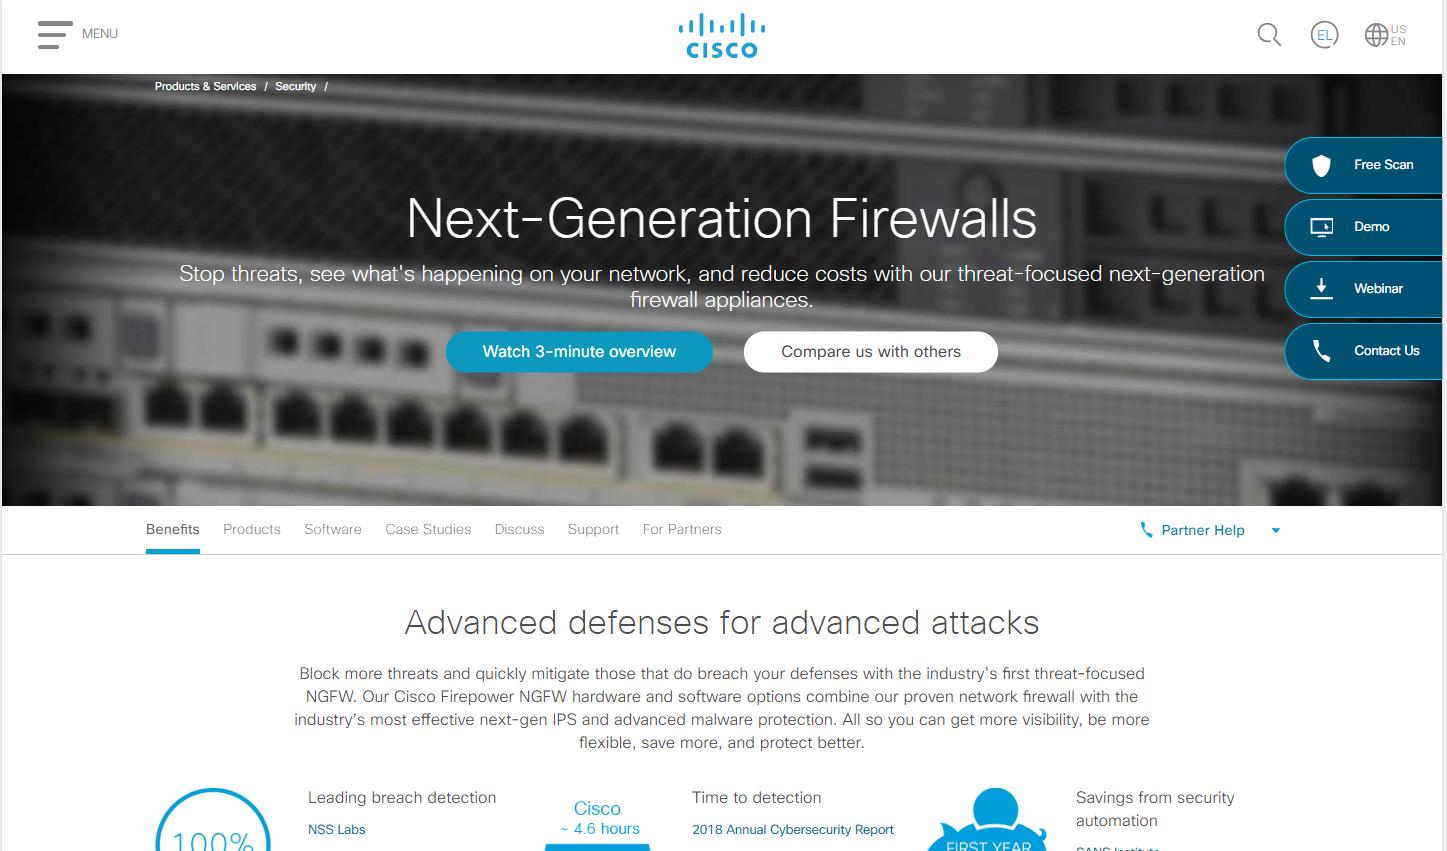 Next-Generation Firewalls